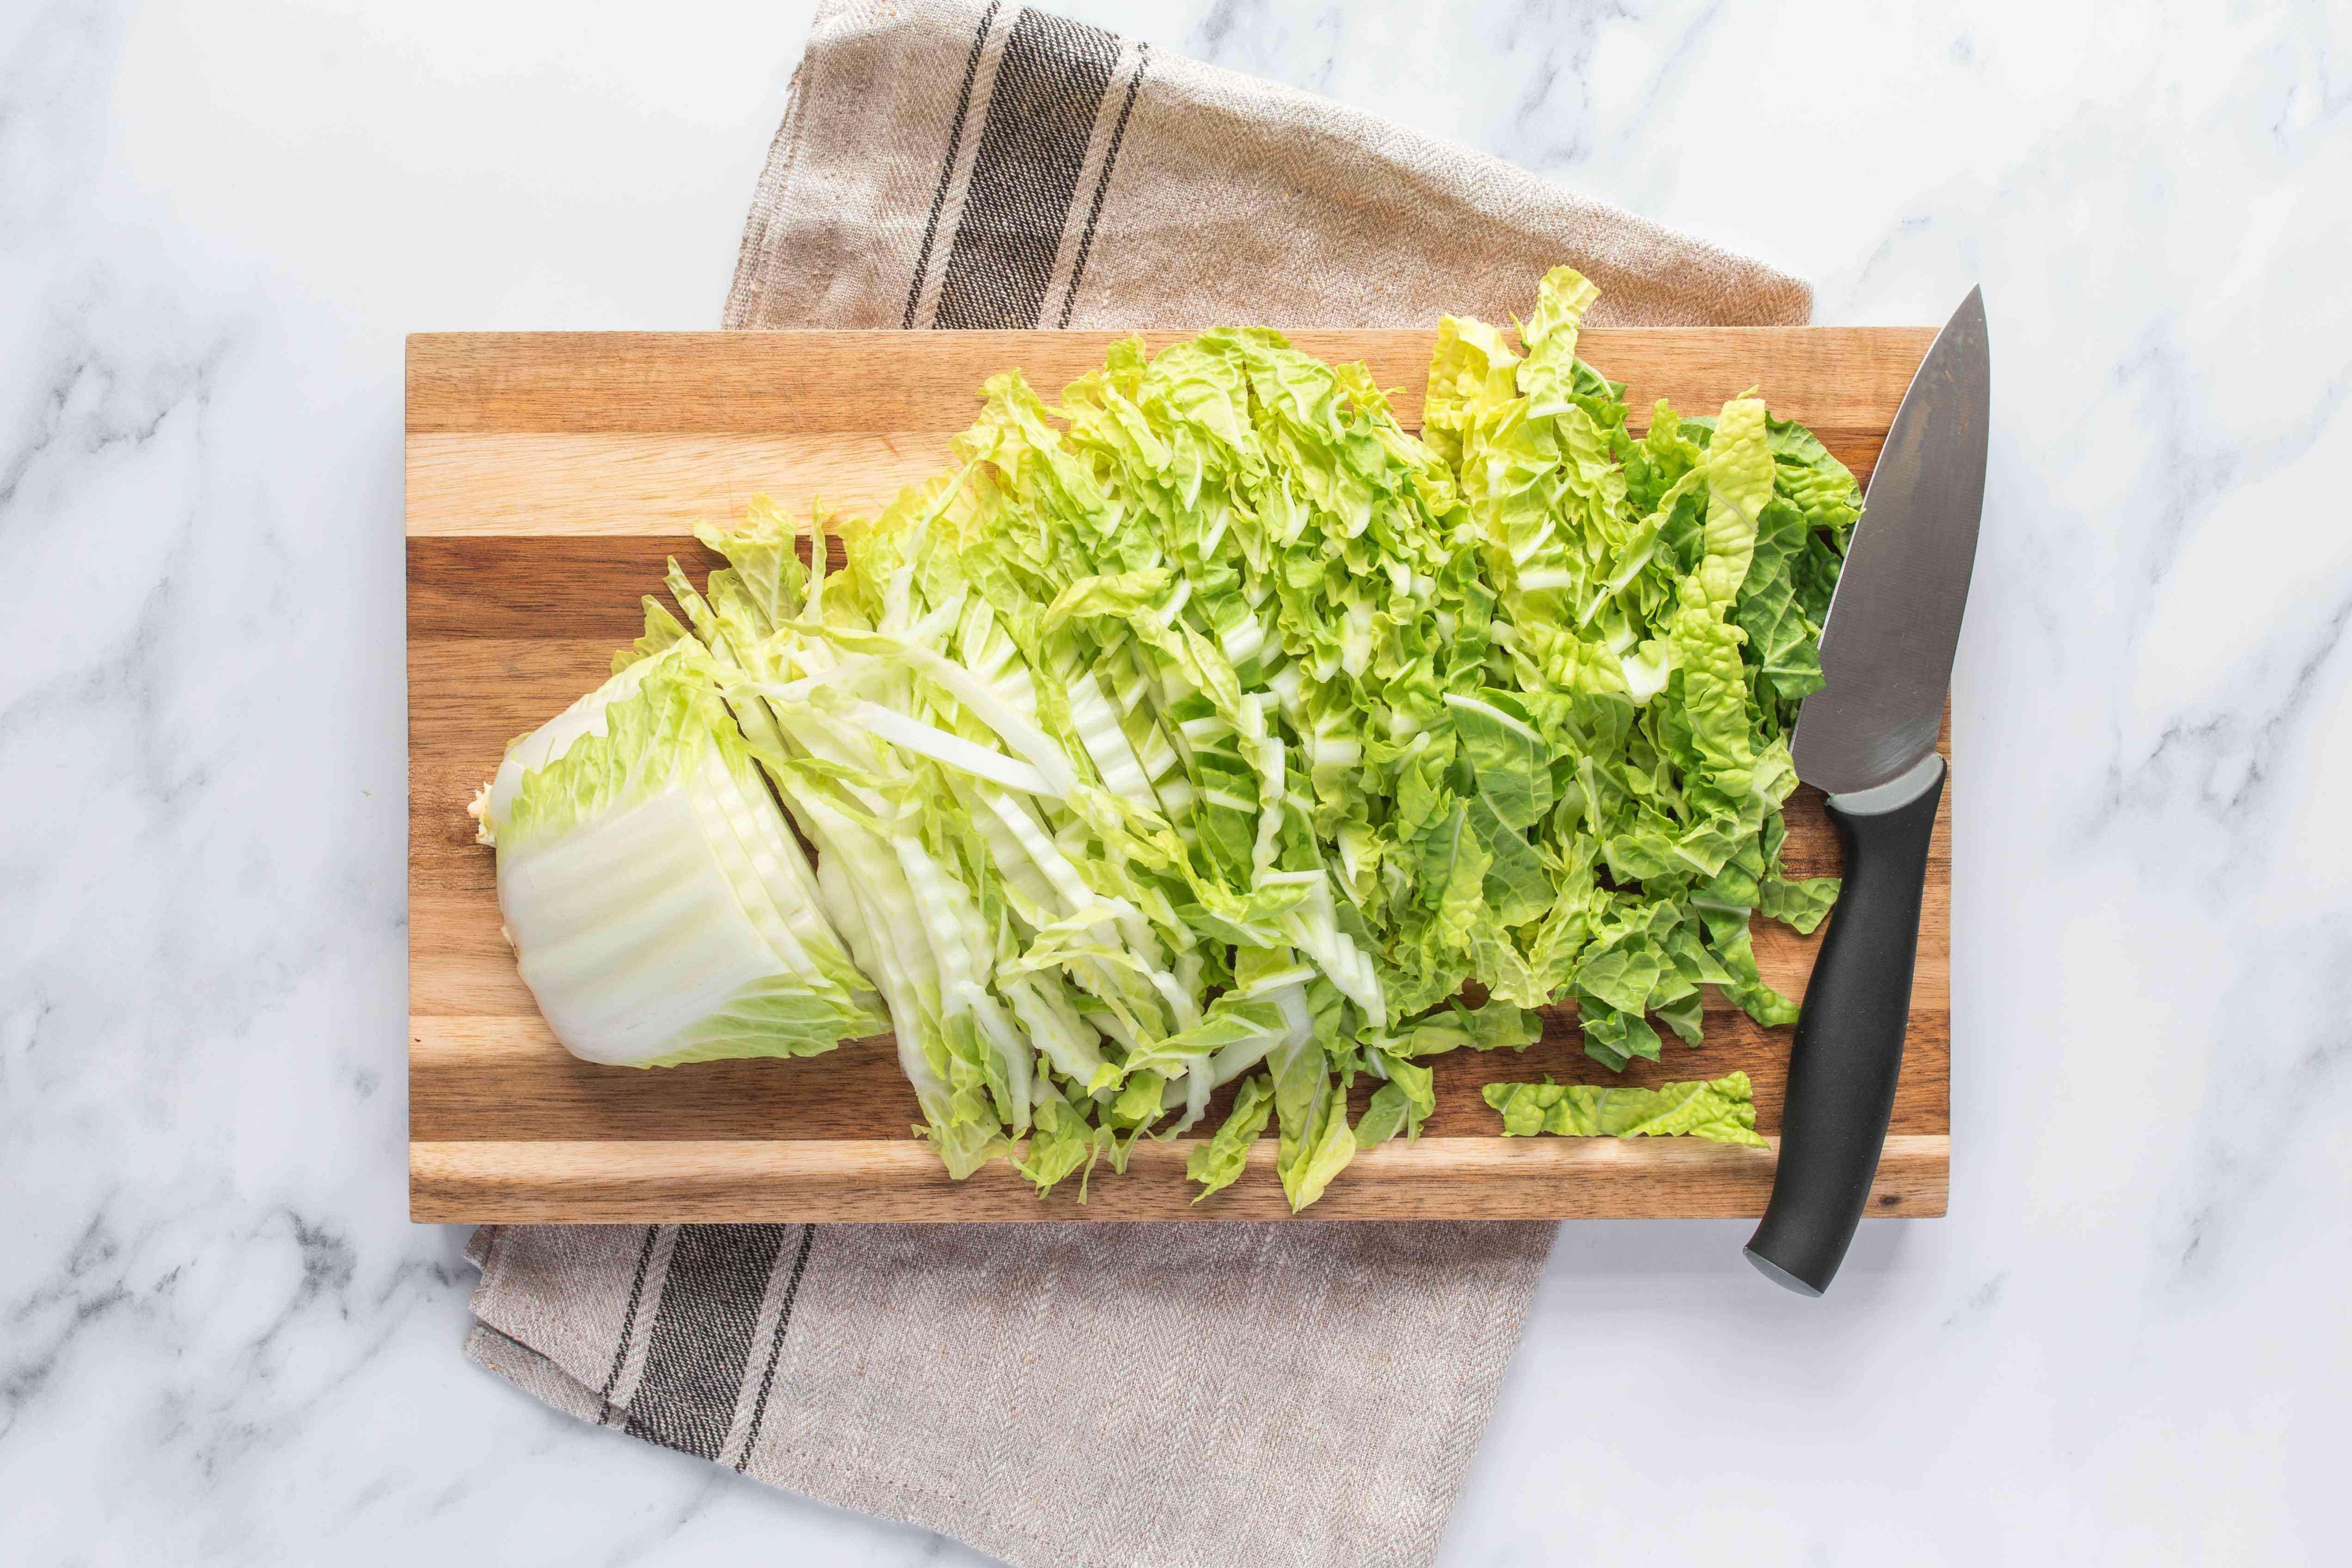 Finely chopped napa cabbage